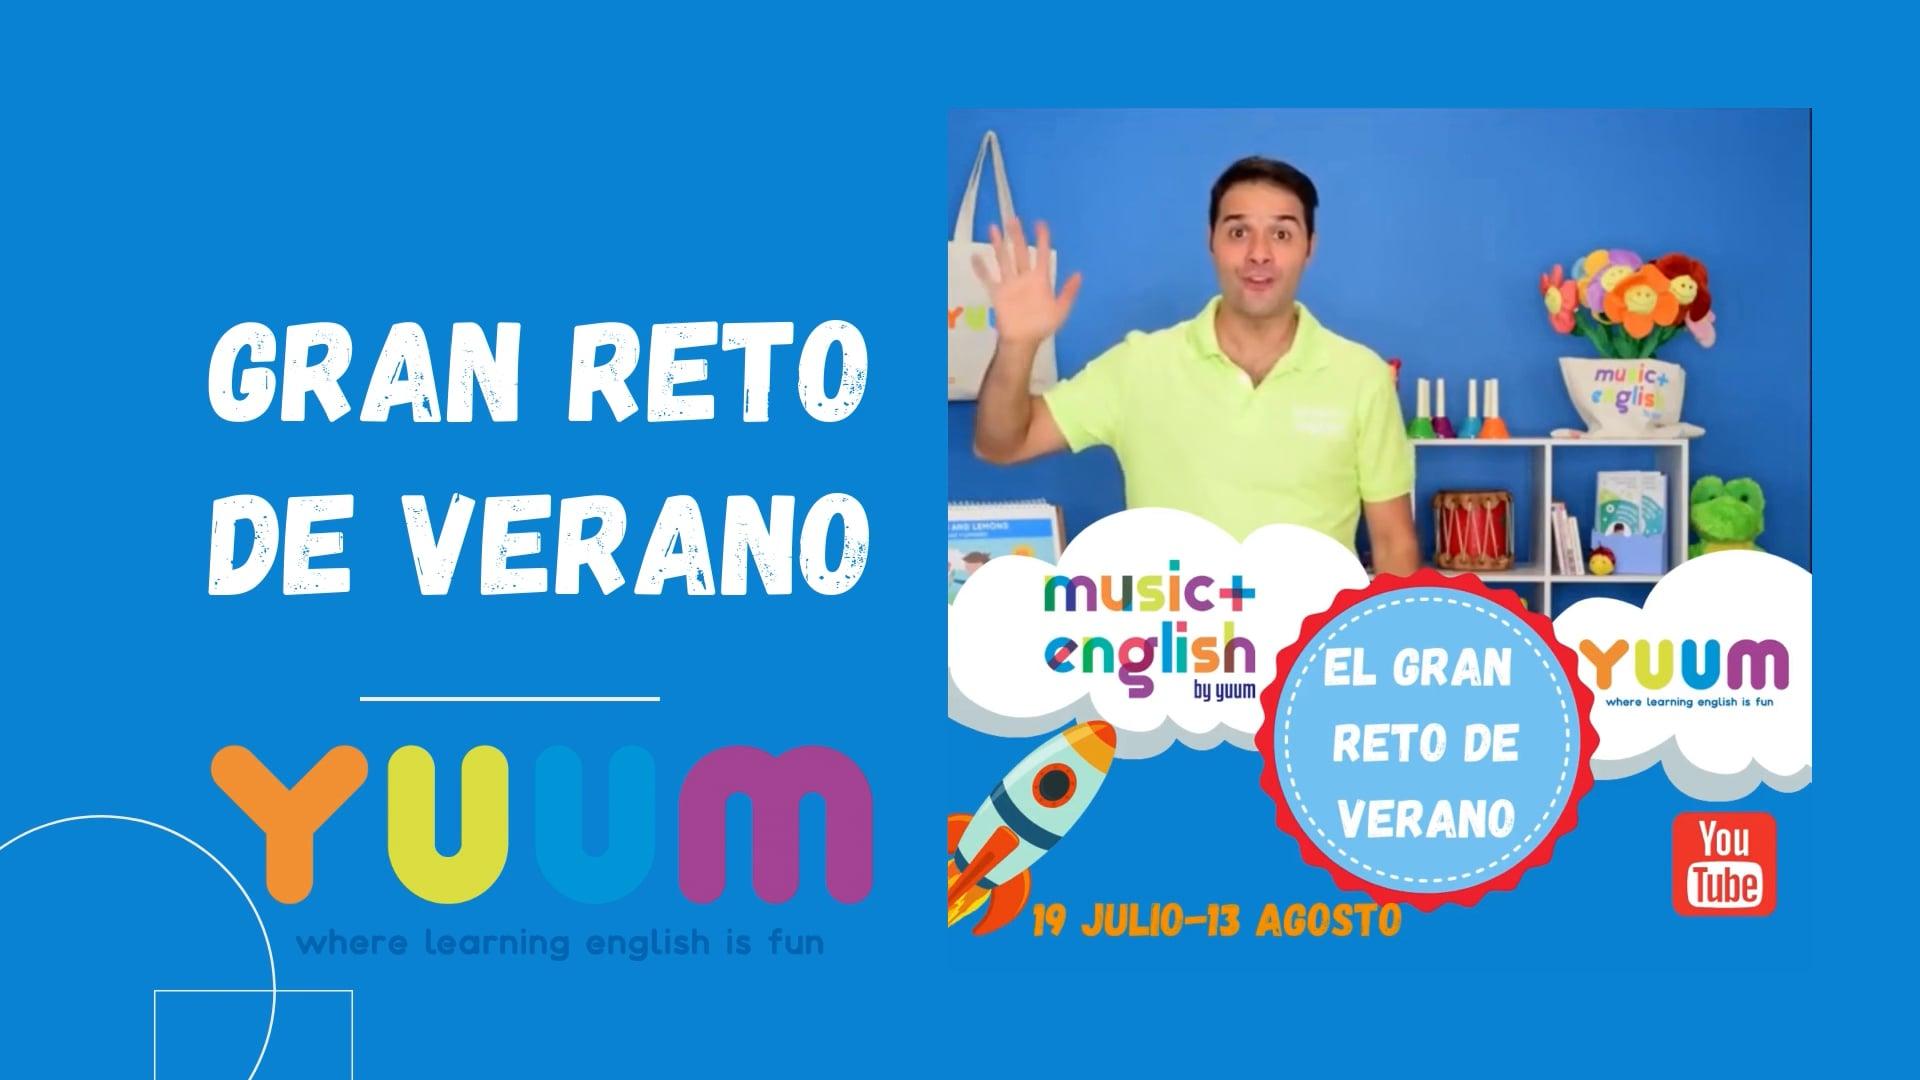 Video TESTIMONIAL DEL GRAN RETO DE VERANO